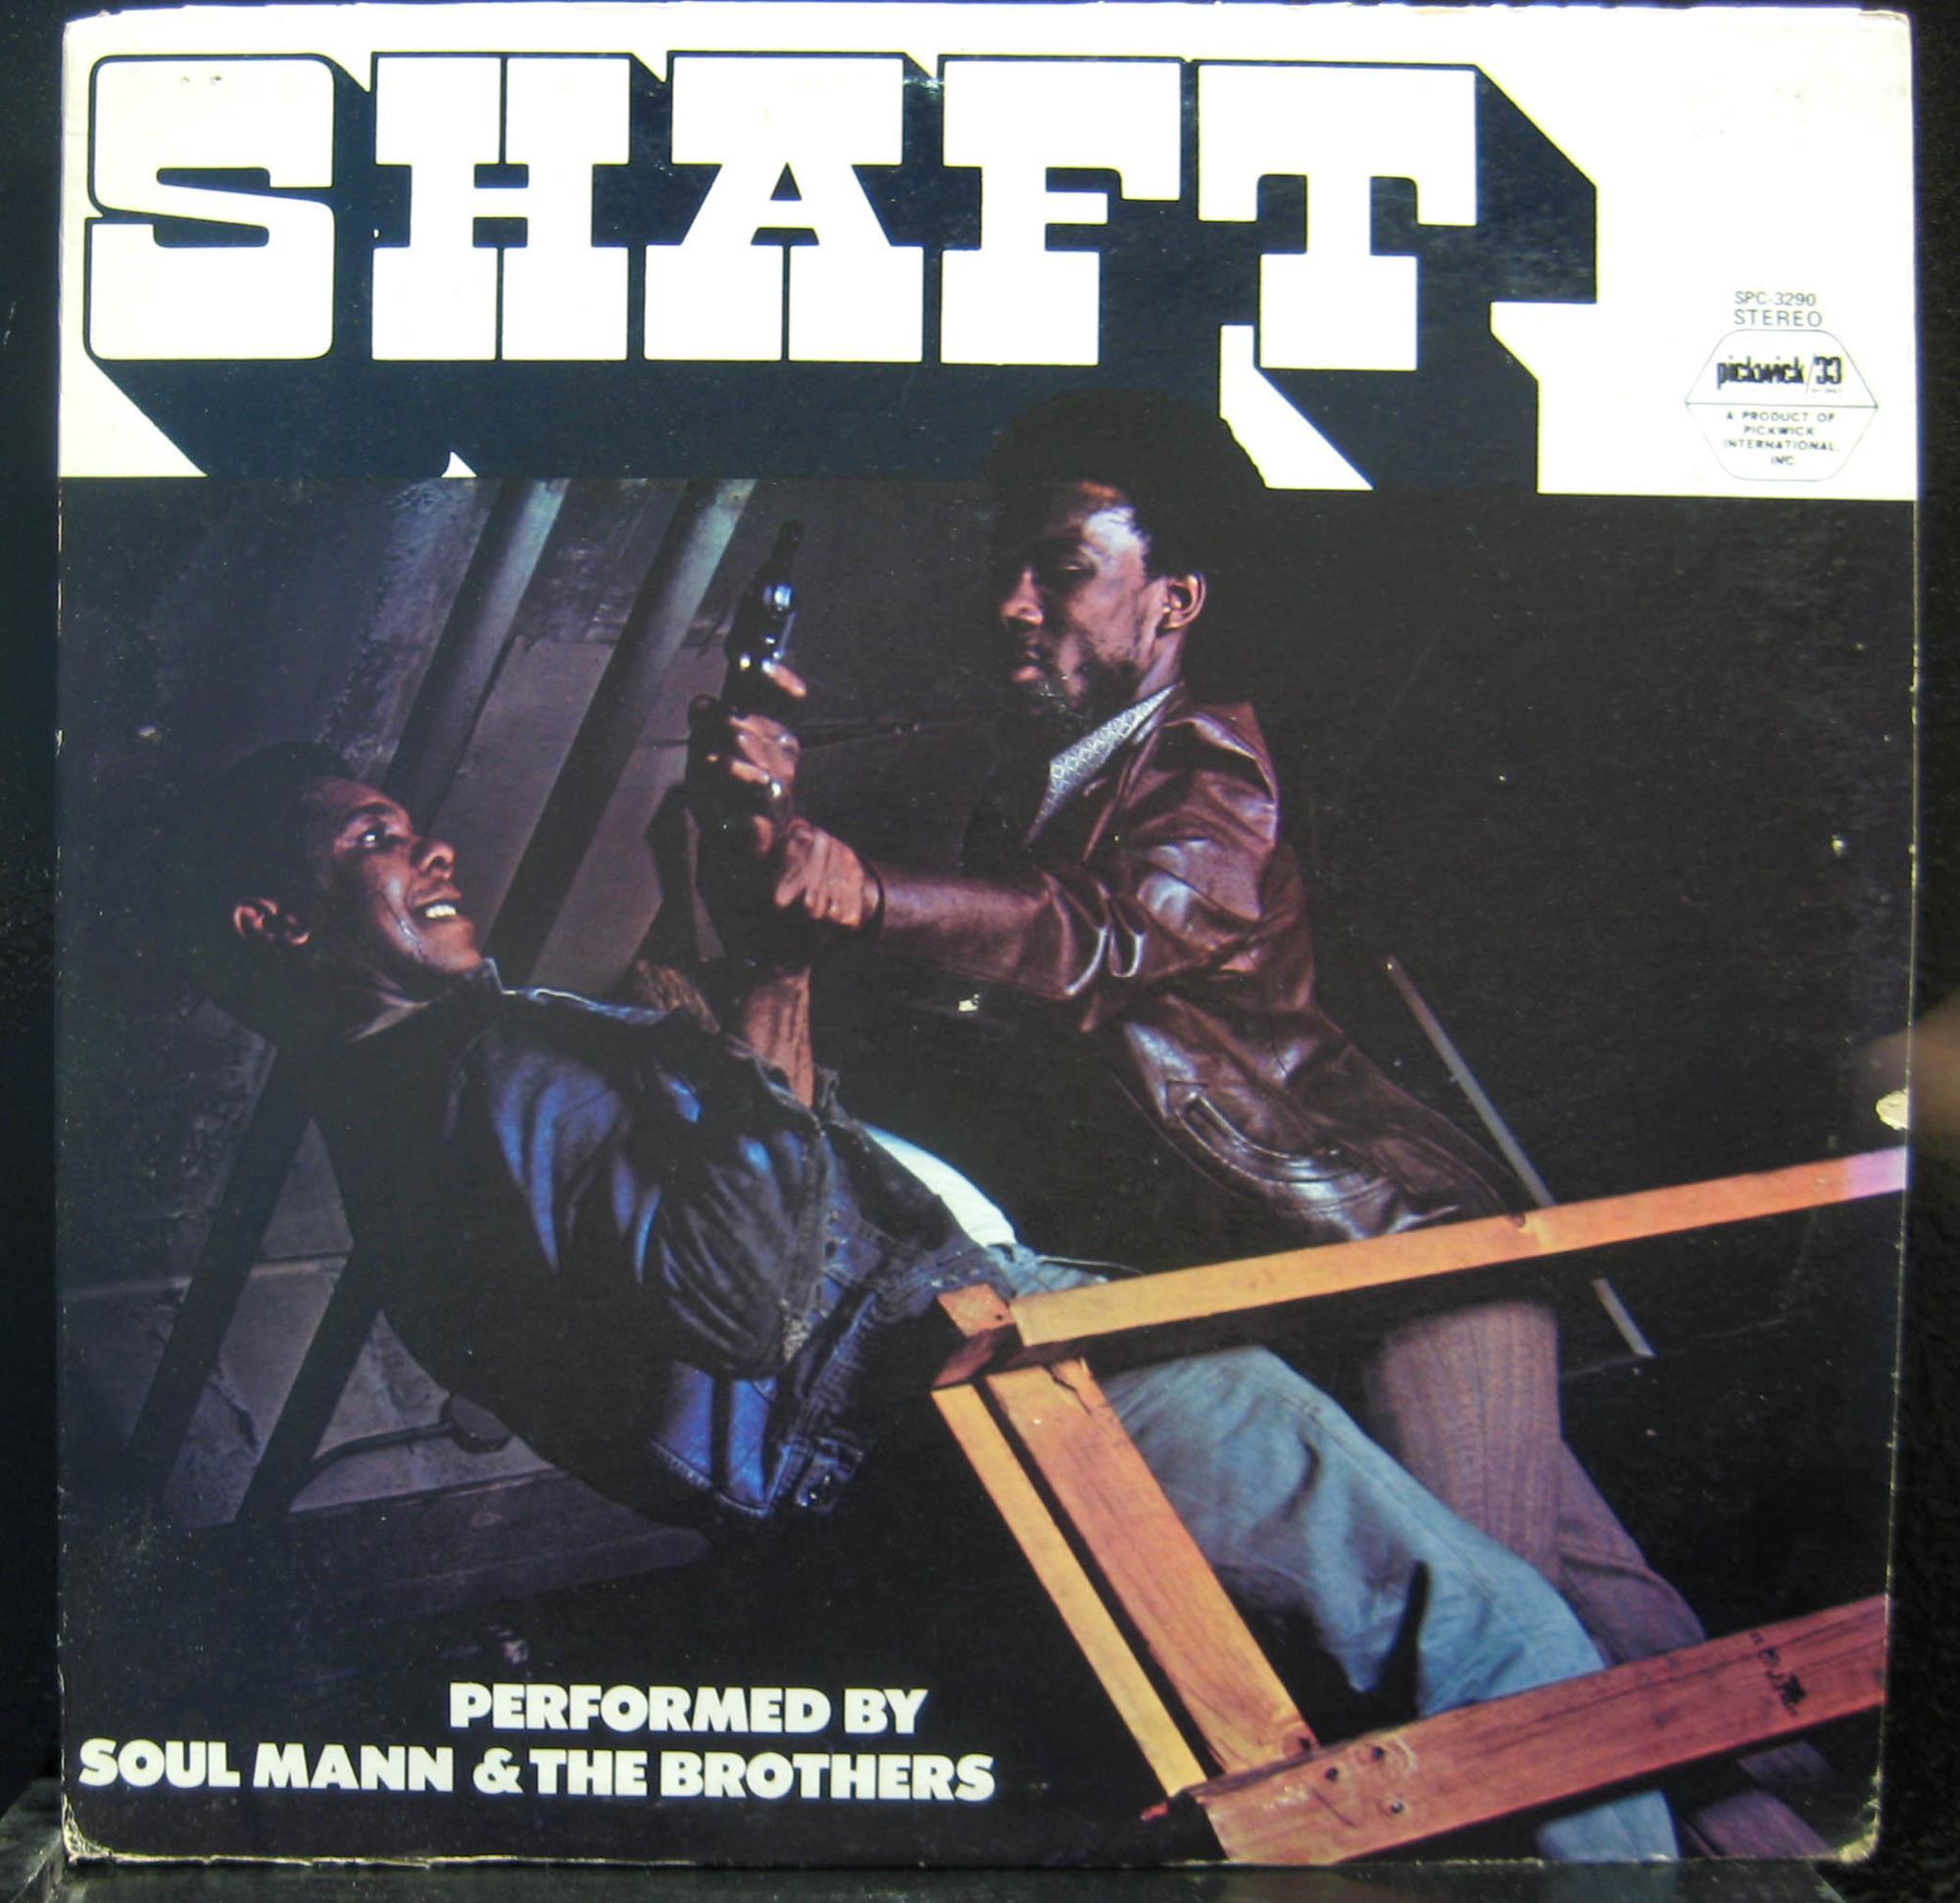 SOUL MANN & THE BROTHERS - Soul Mann & The Brothers Shaft Lp Vg+ Spc 3290 Vinyl 1971 Record (shaft)